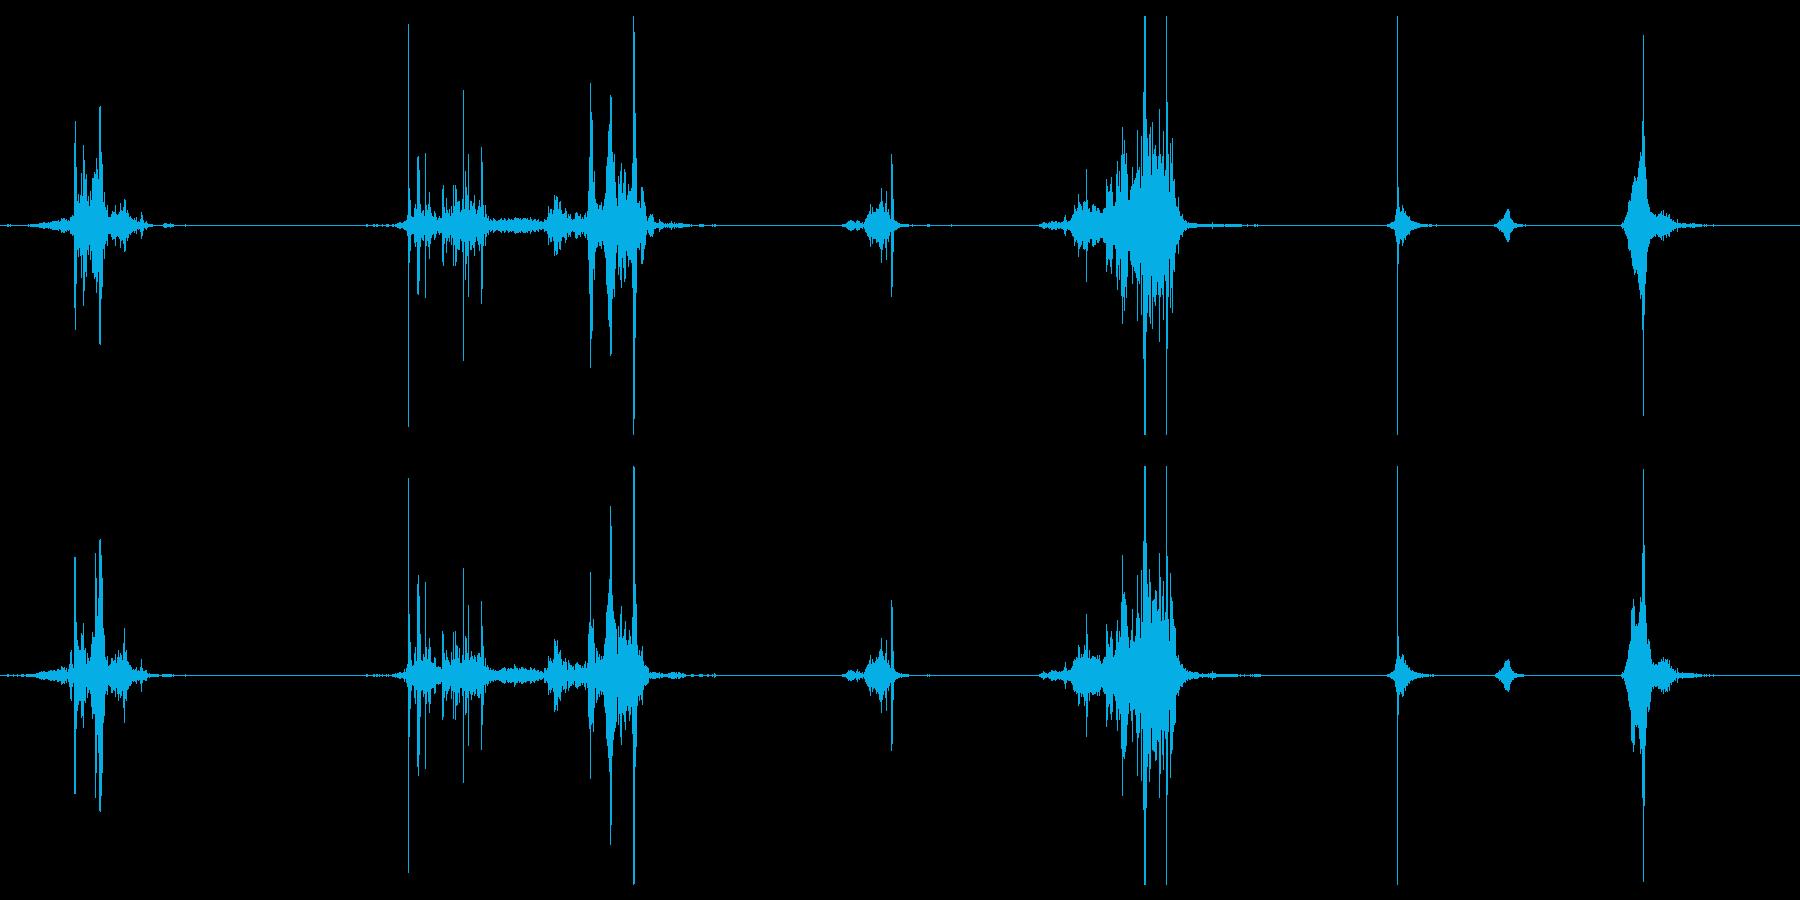 ASMR りんごを歯でかじりついている音の再生済みの波形